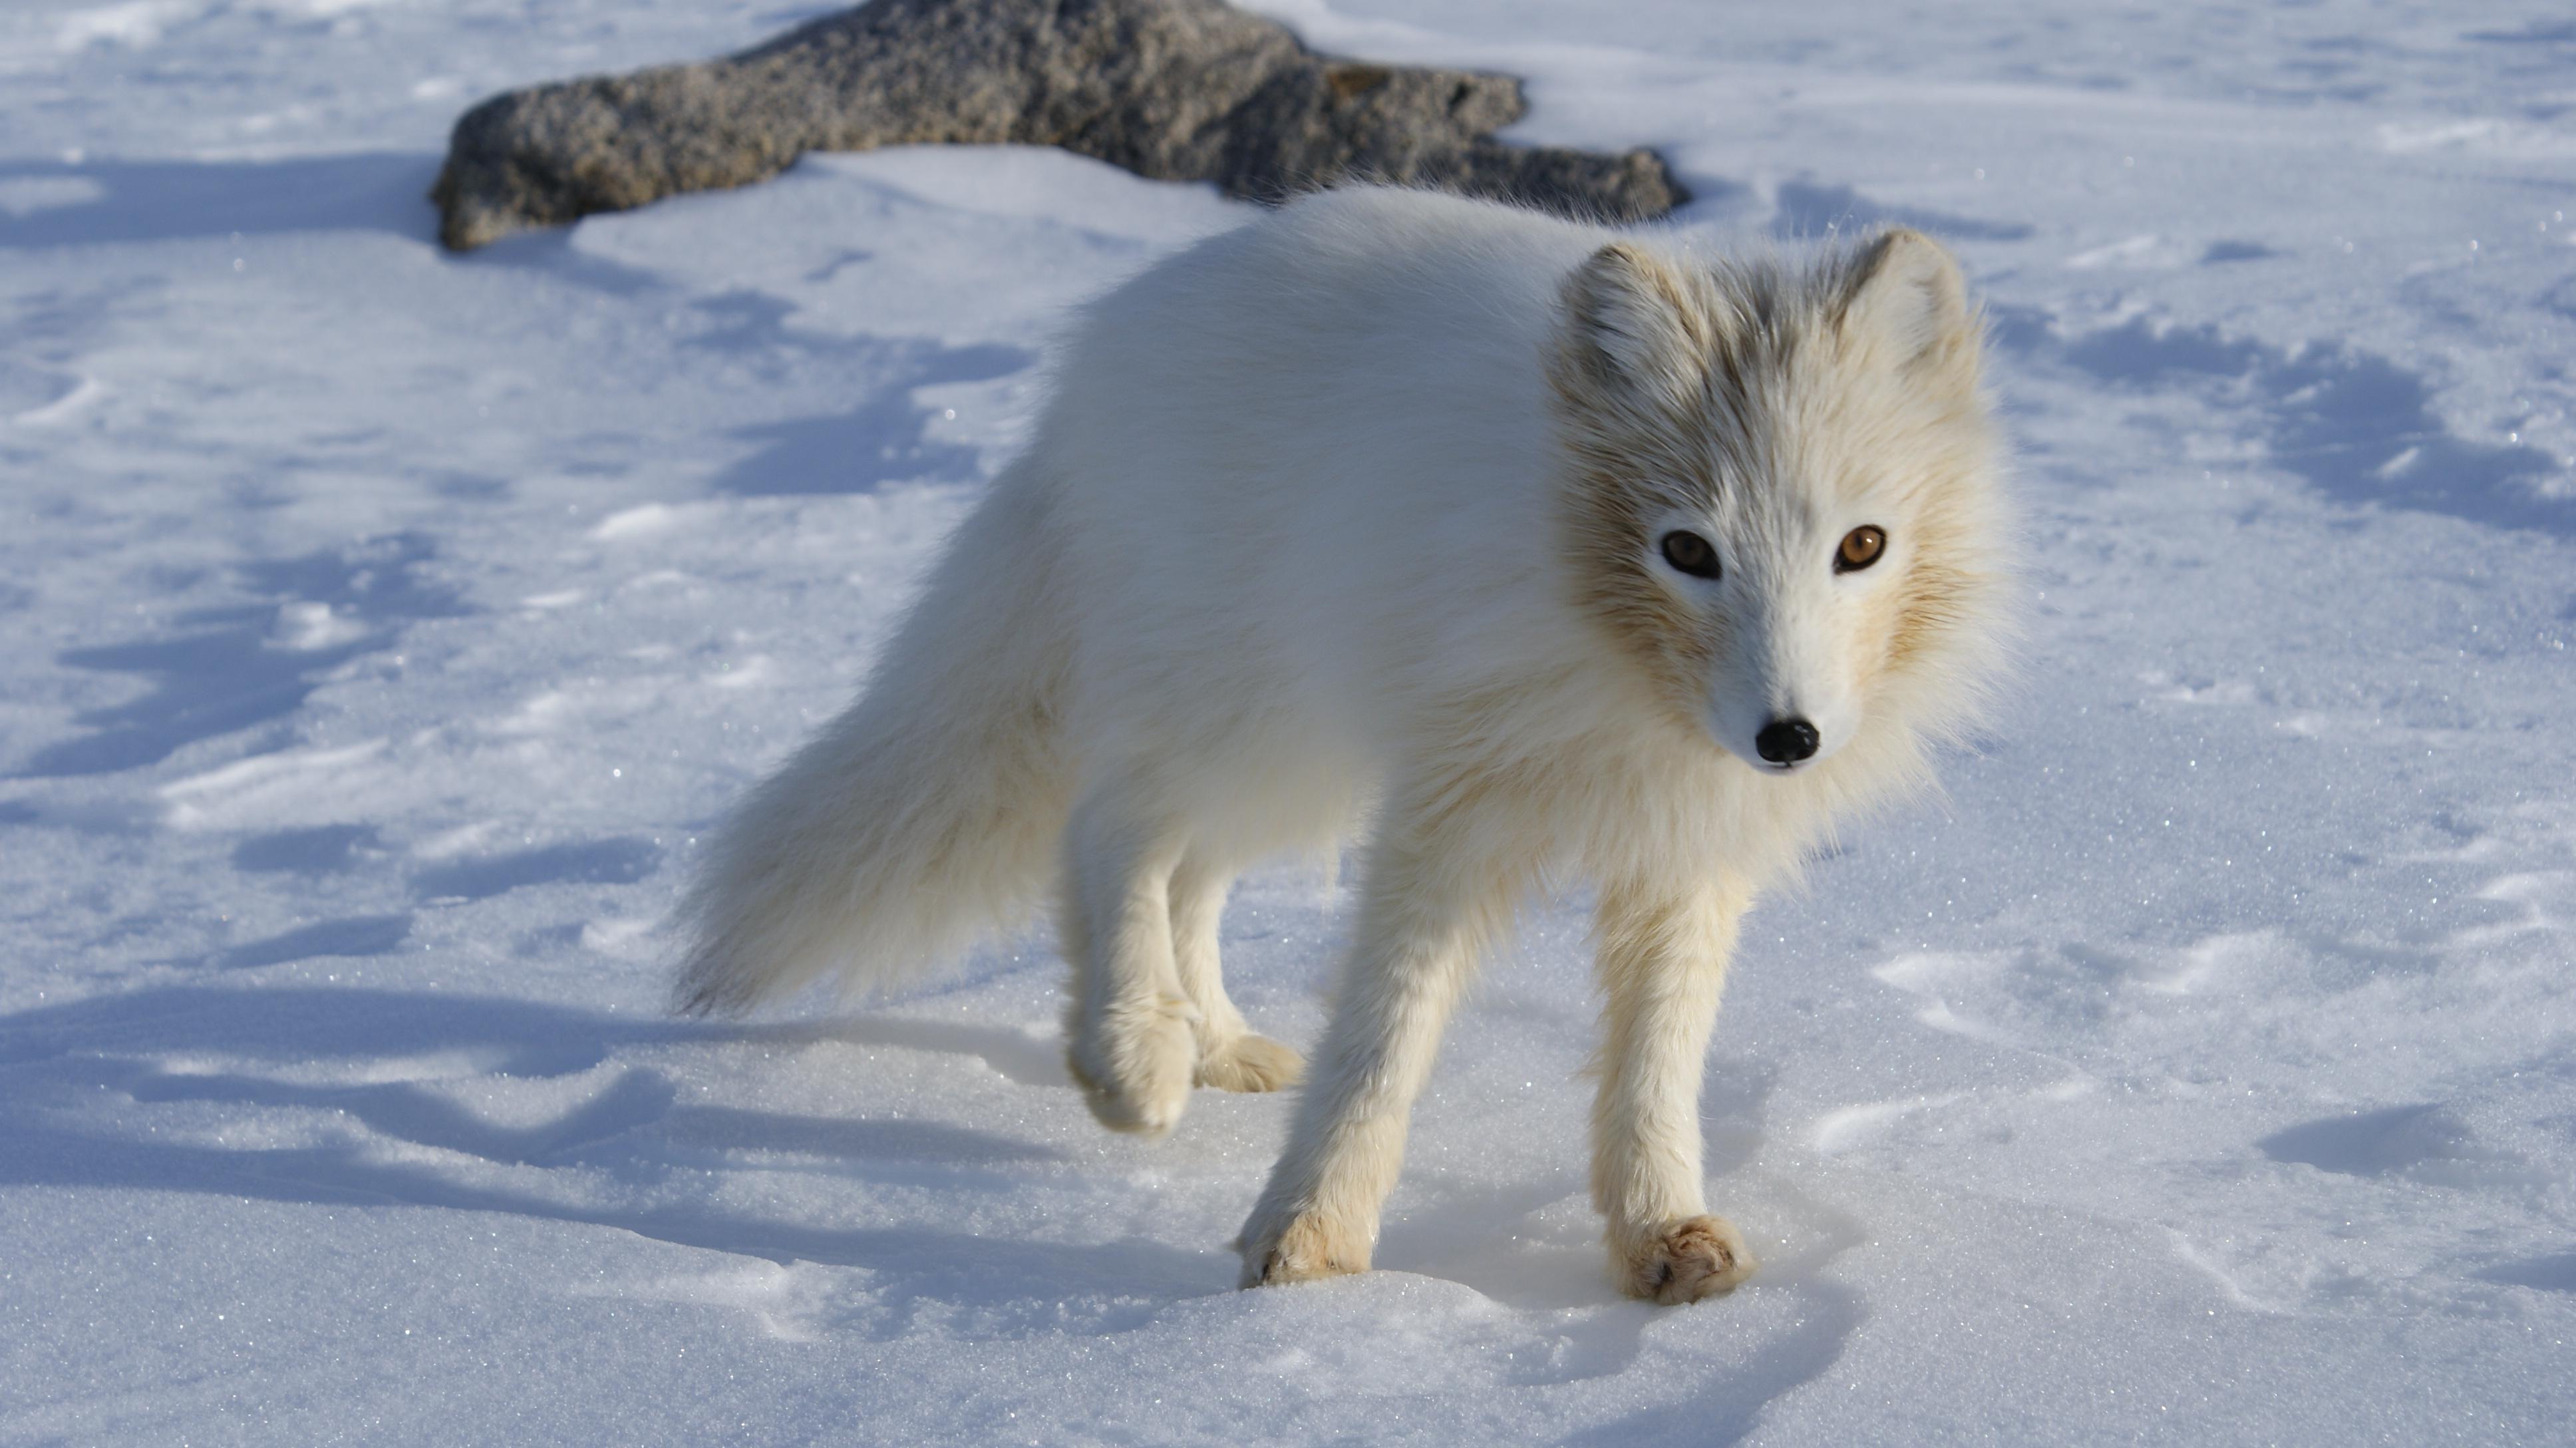 Arctic Fox Wallpapers Hq